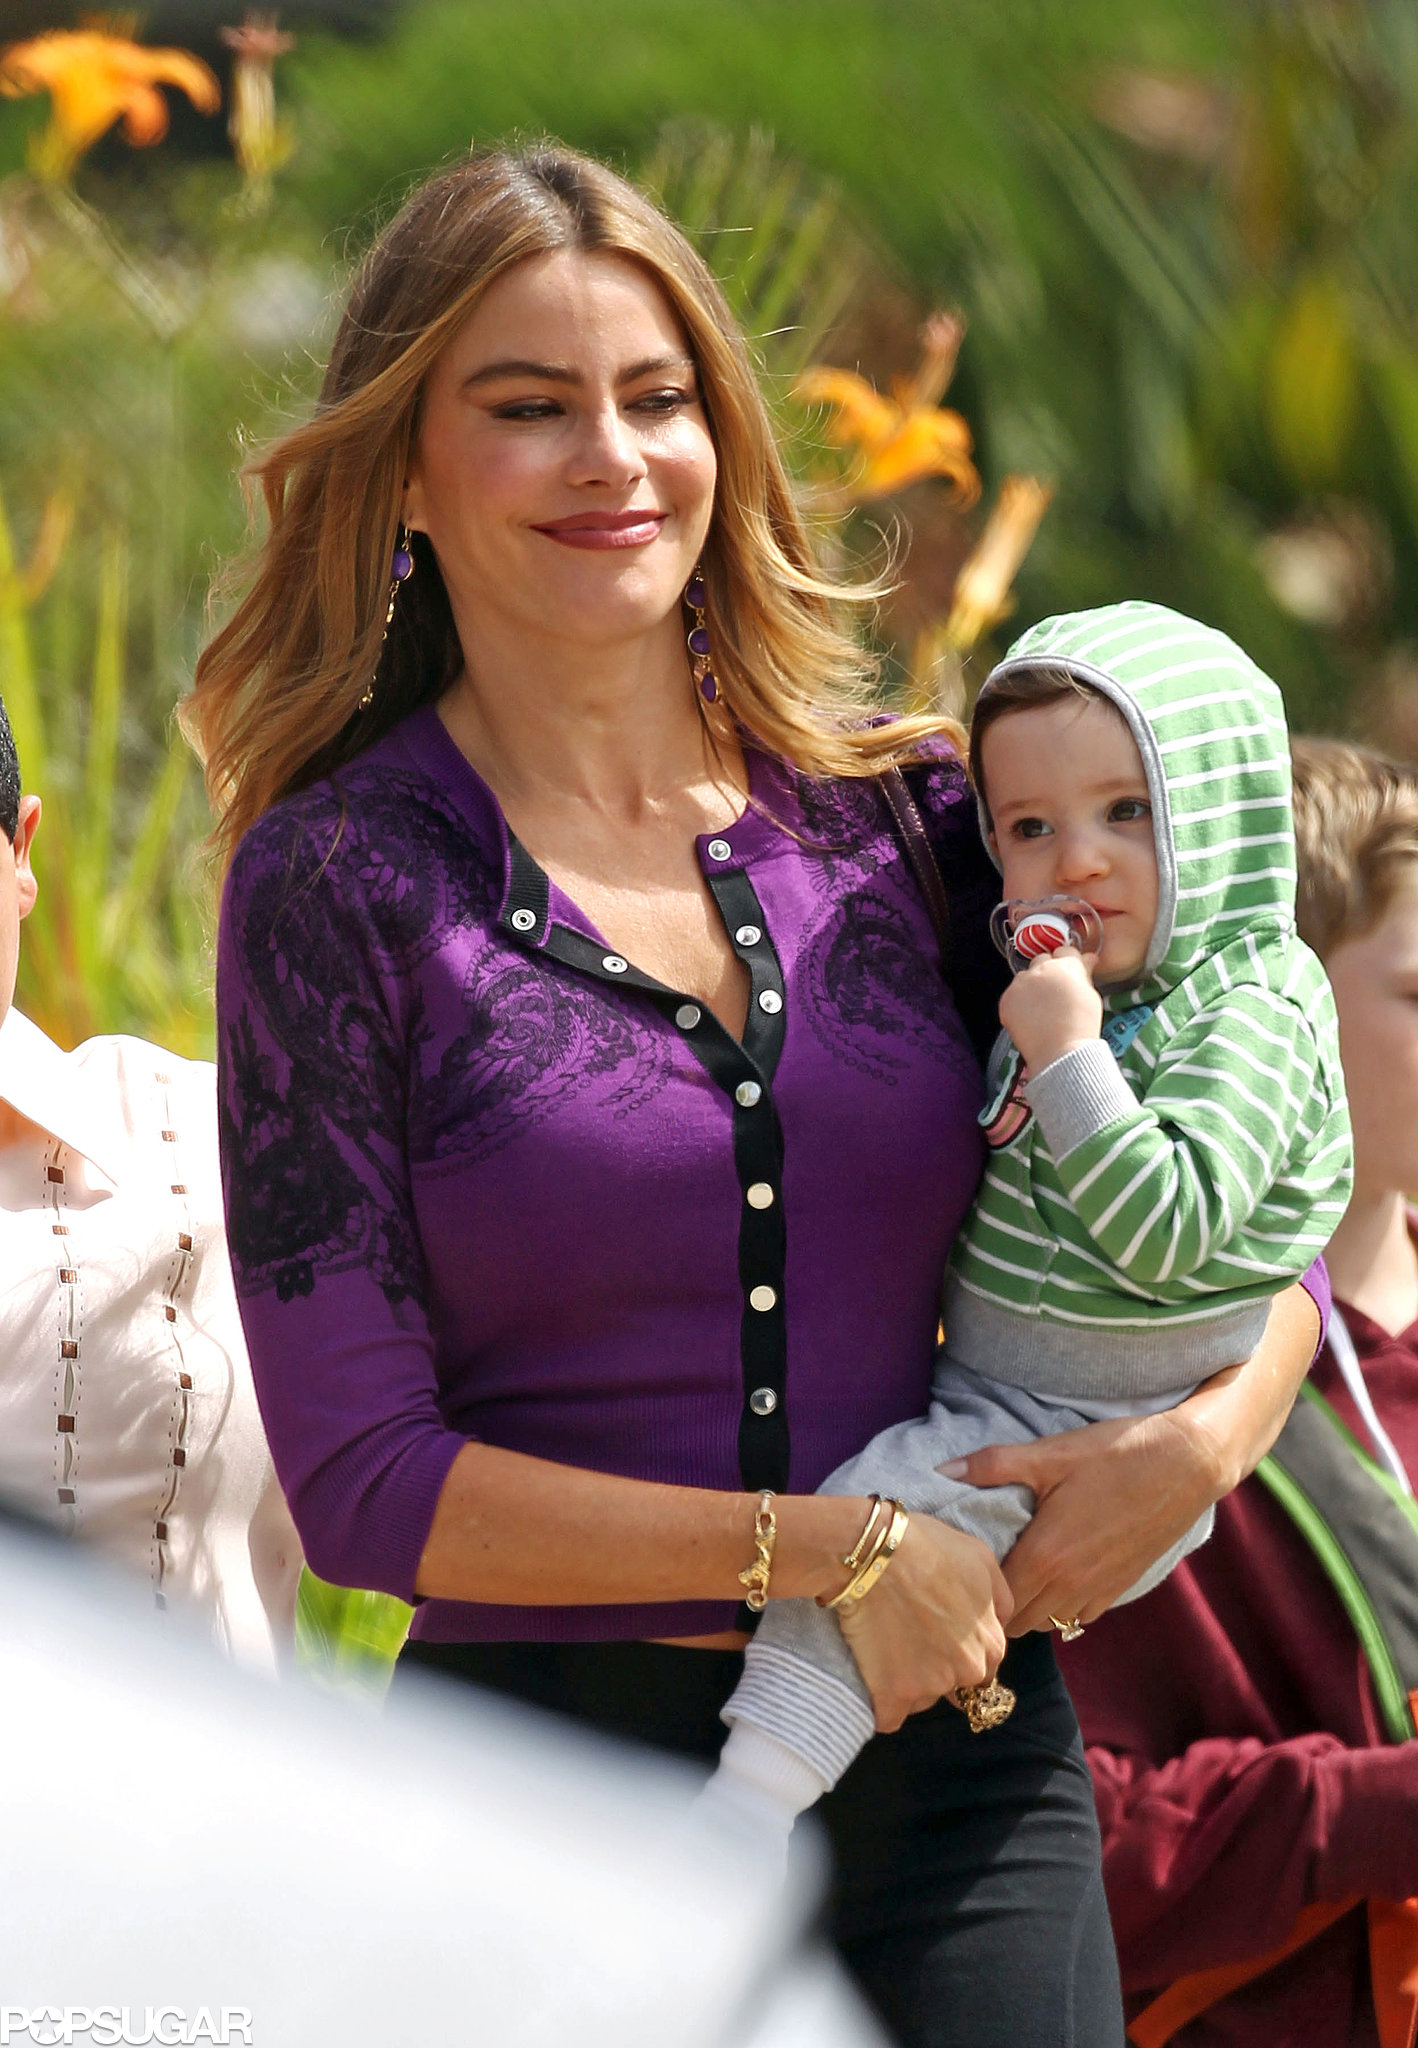 Sofia Vergara held her TV baby while filming Modern Family in LA.